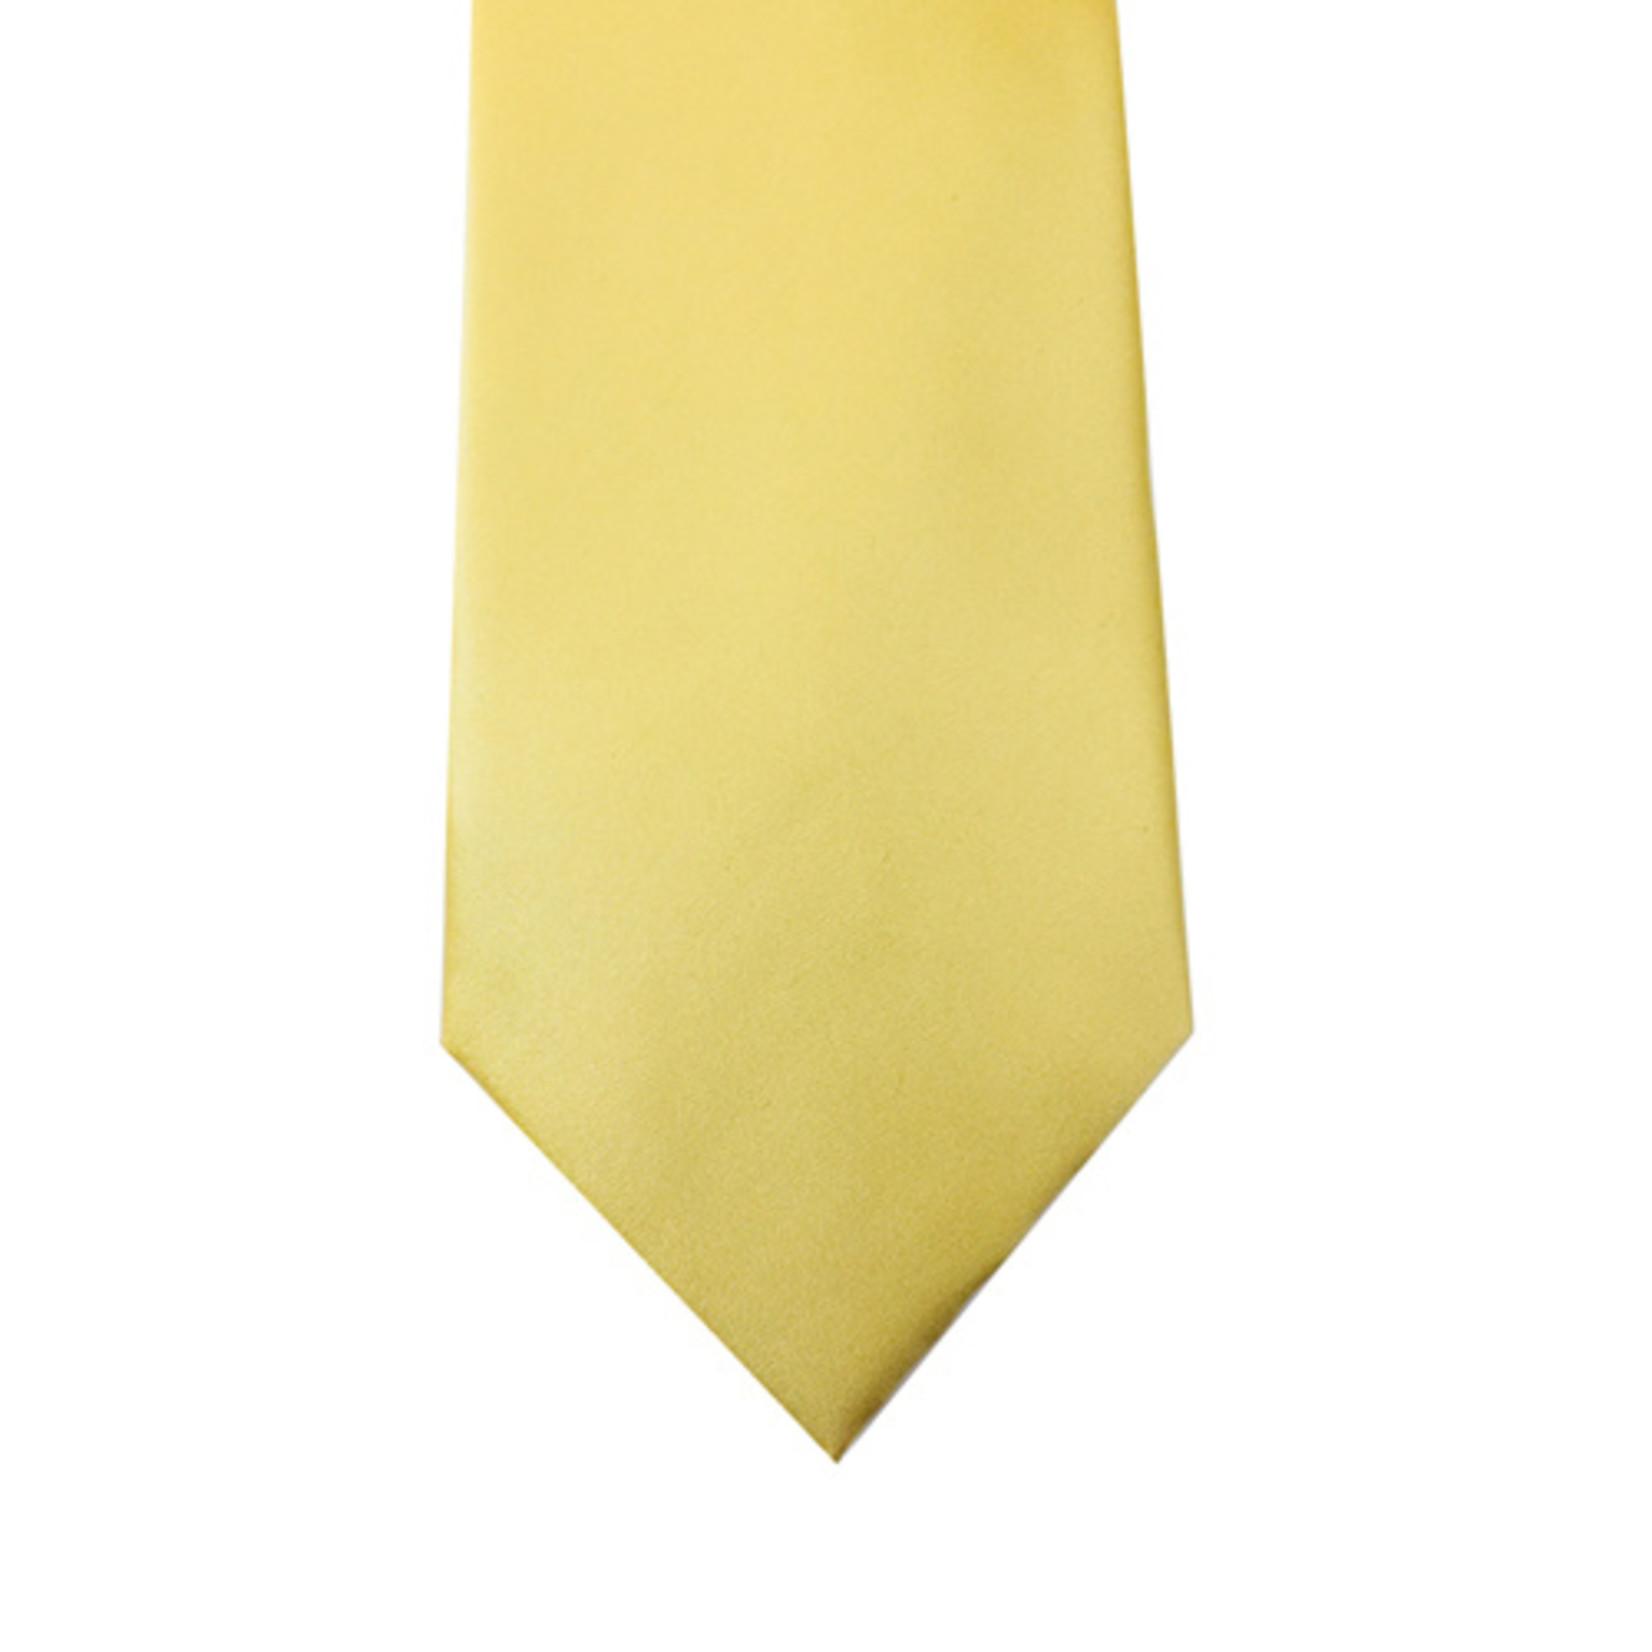 Knotz M100-26 Solid Yellow Tie